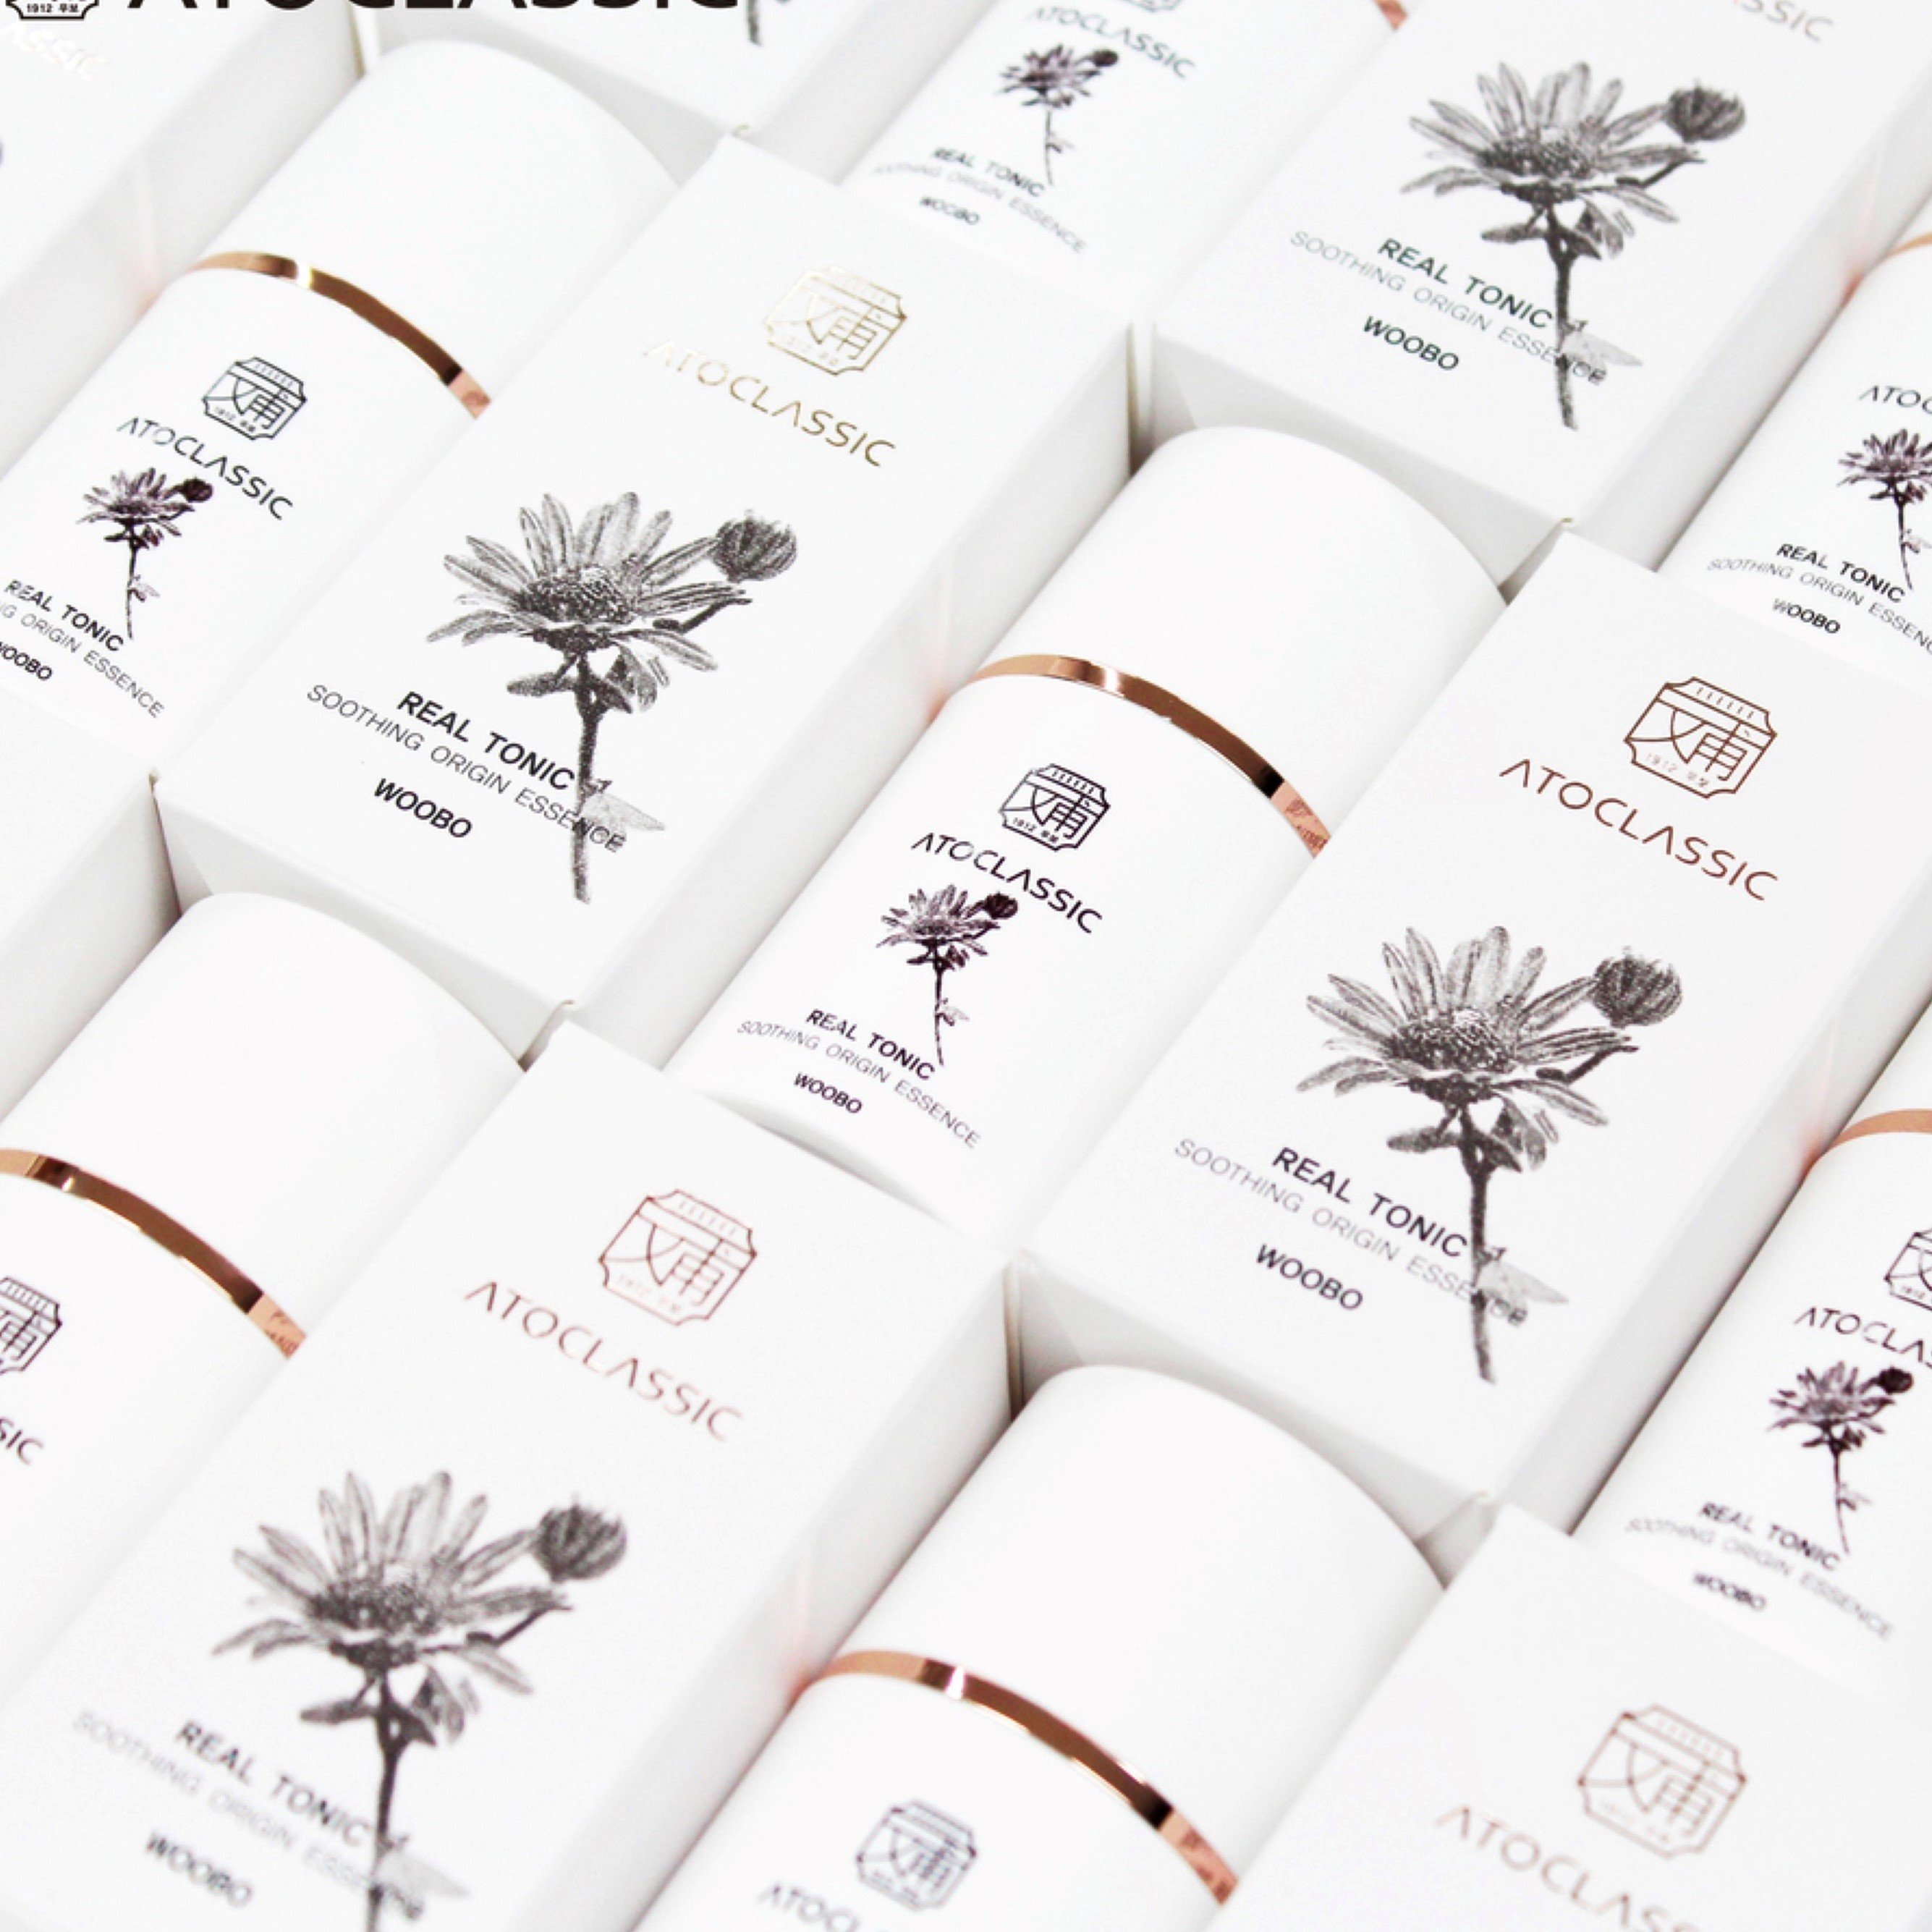 Korean Skincare Atoclassic Soothing Essence